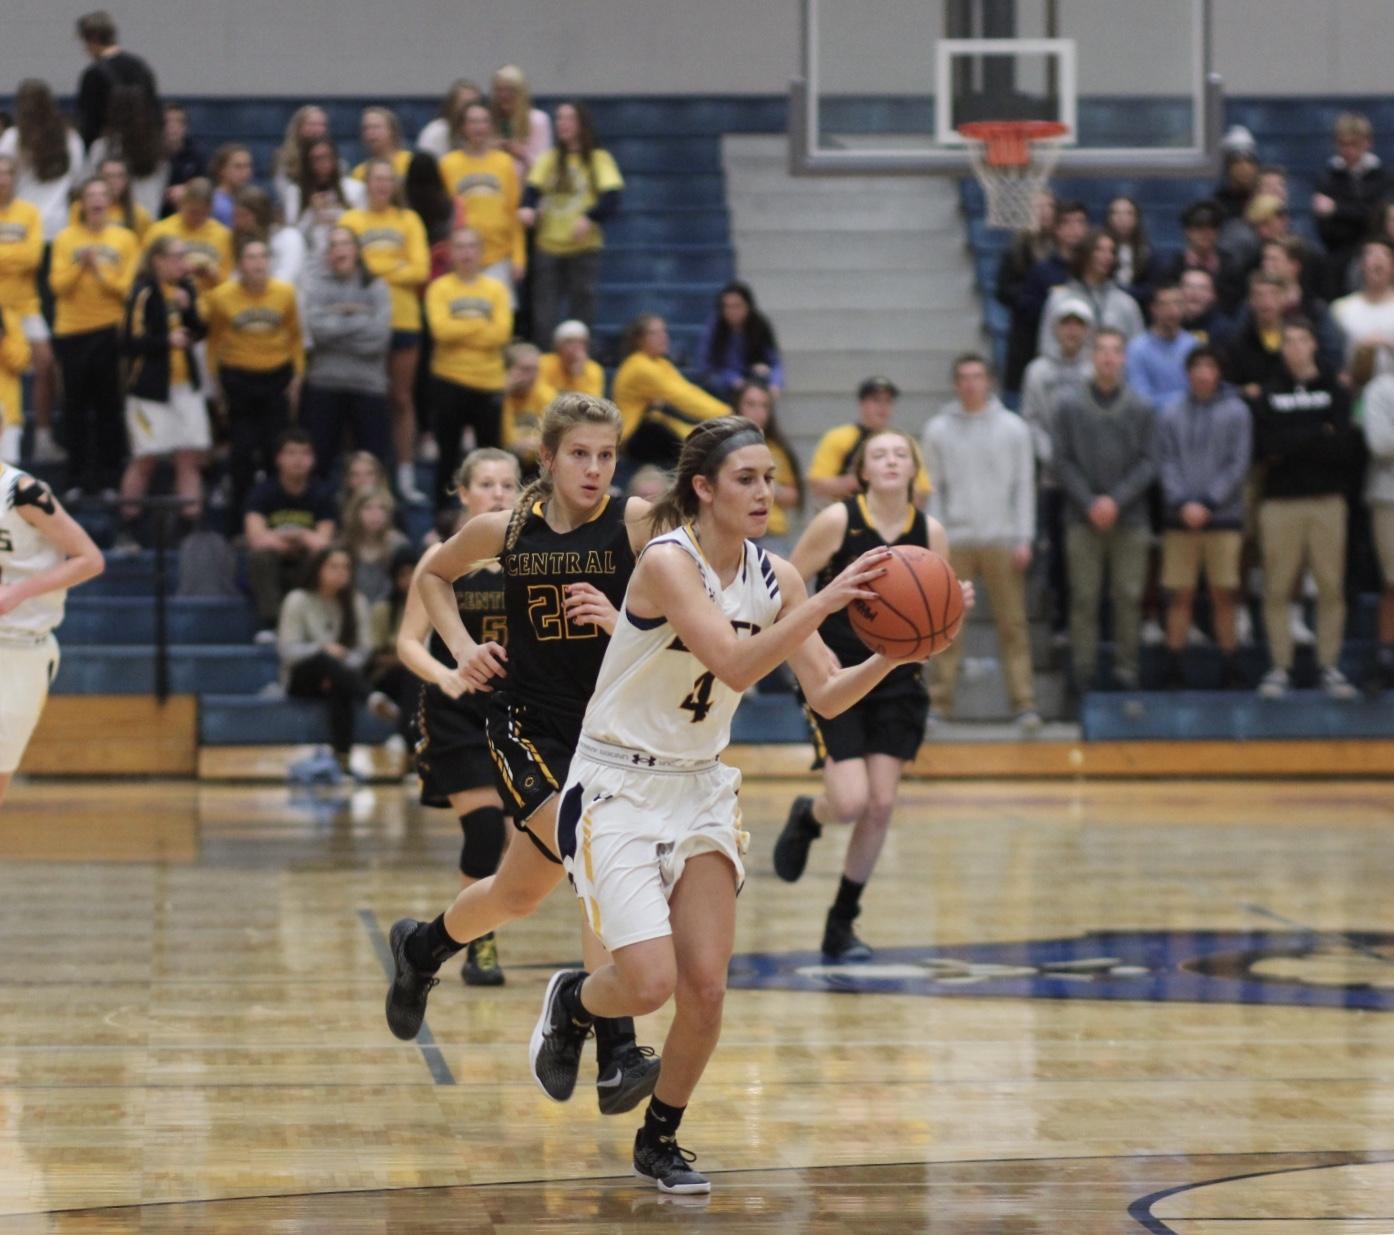 Junior Allie Keyser moves the ball up the court